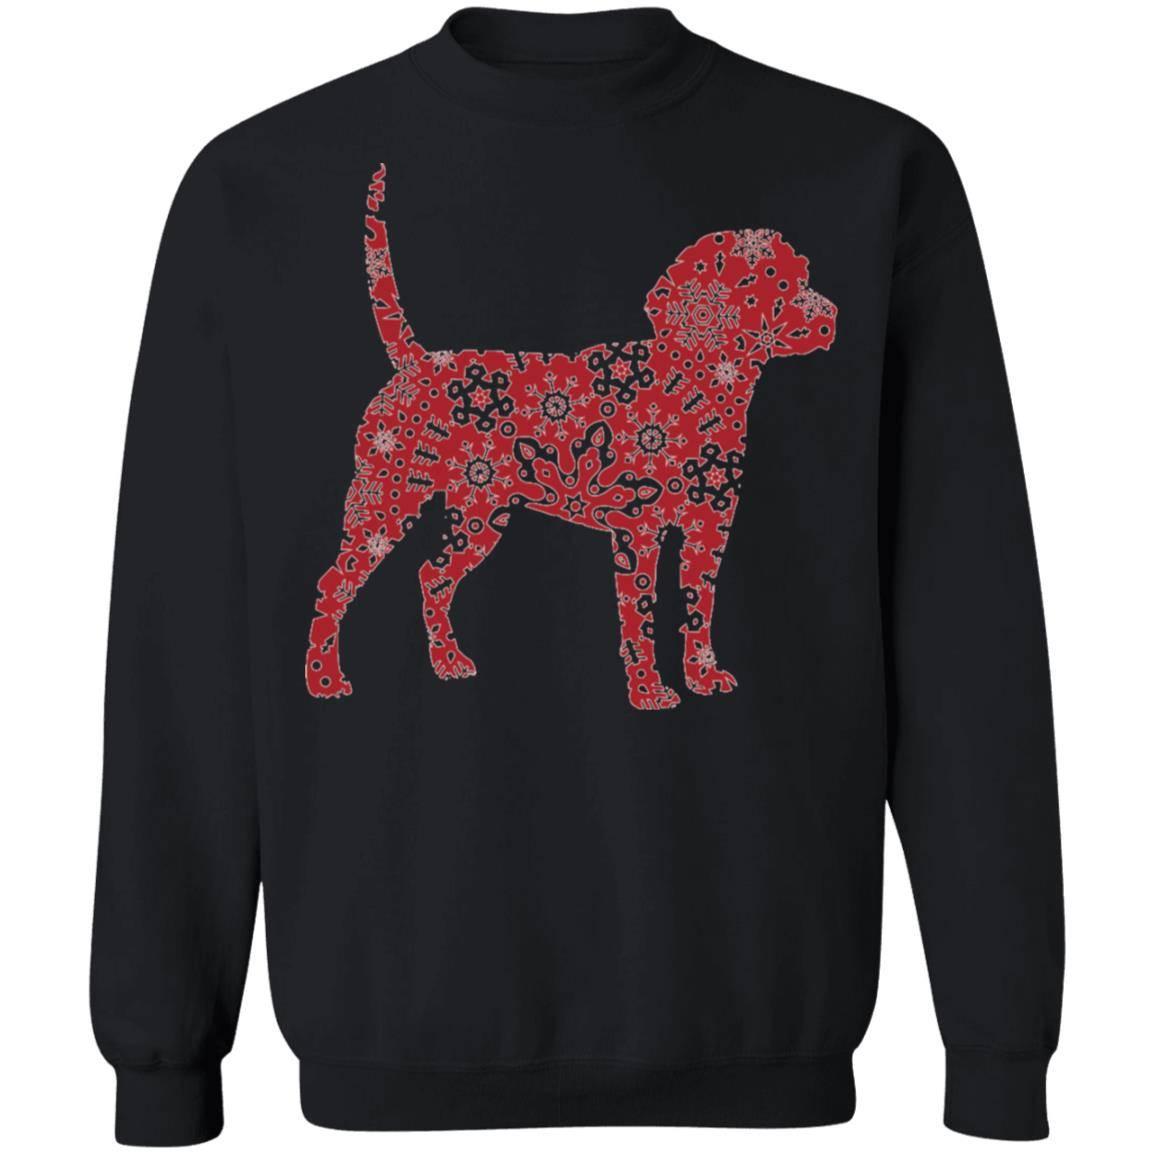 221 – Christmas Boho Red Beagle T shirt G180 Gildan Crewneck Pullover Sweatshirt  8 oz.